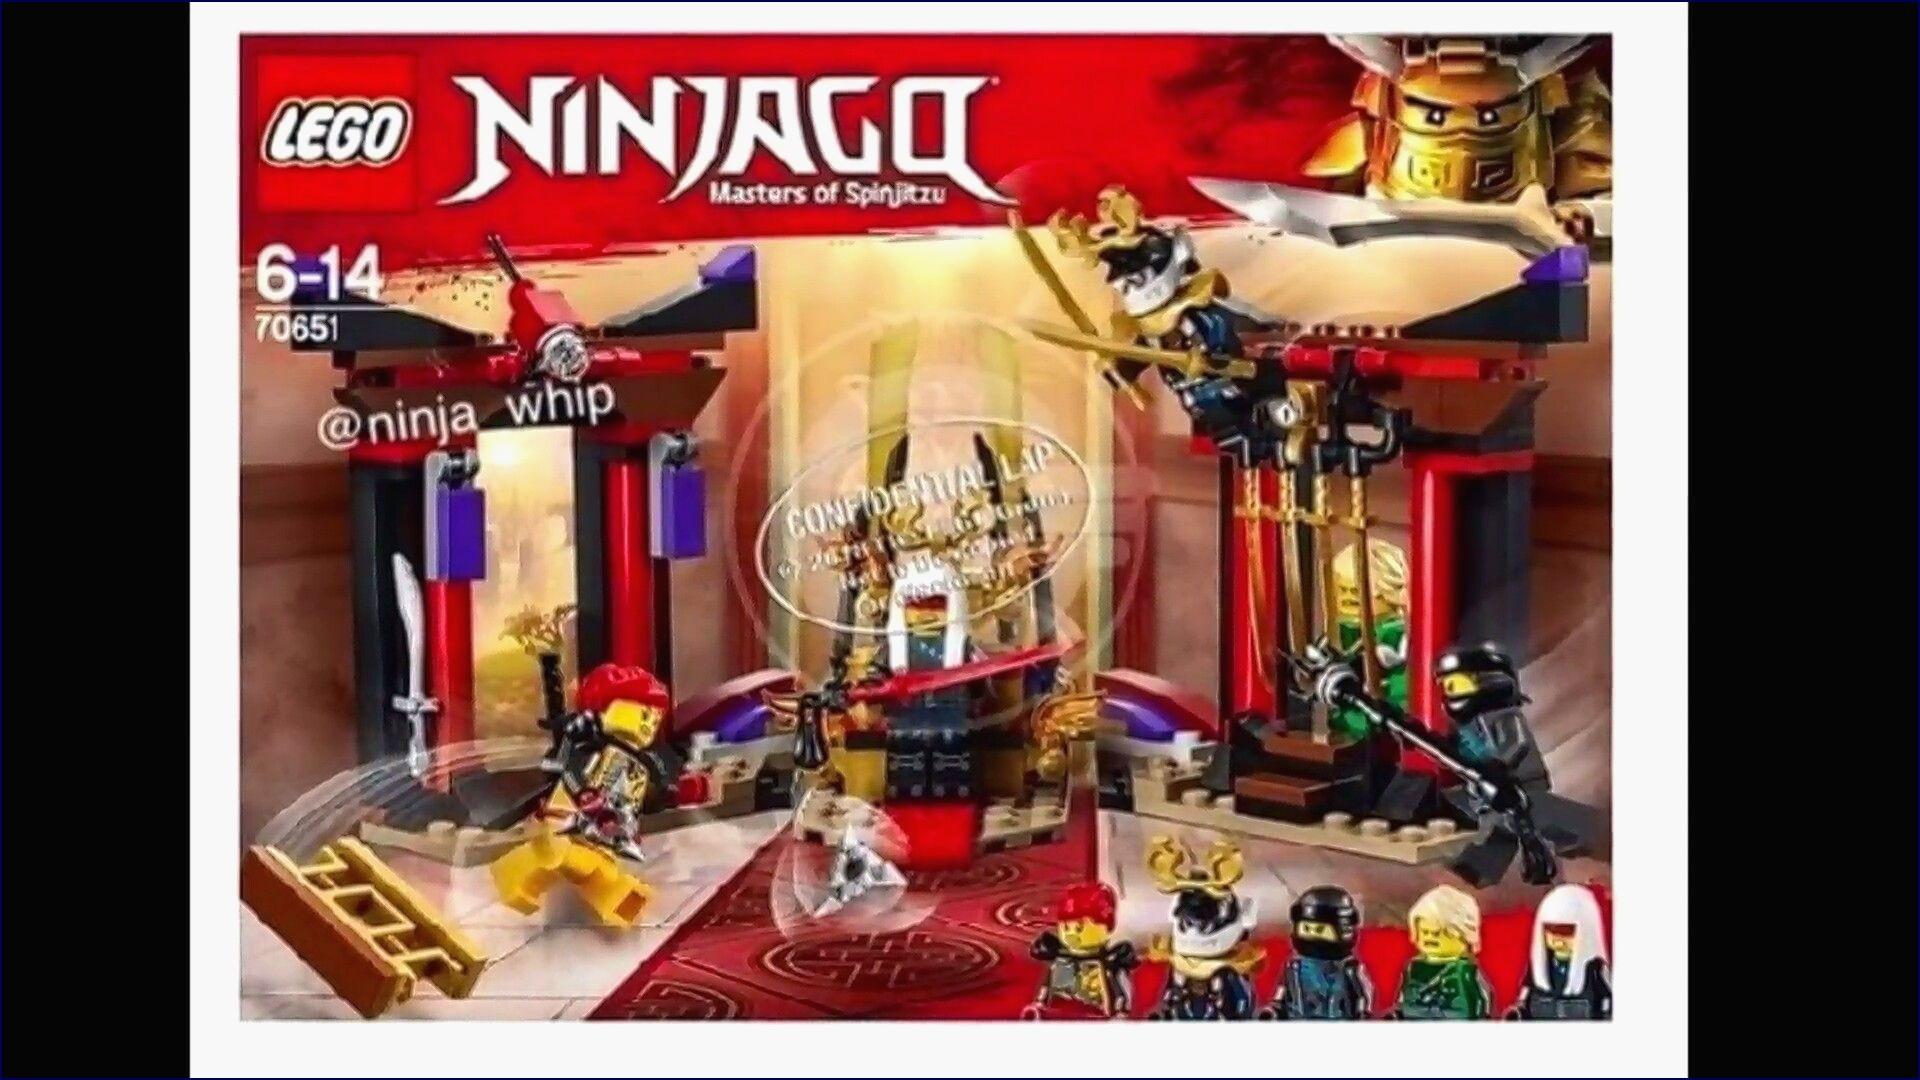 Ausmalbilder Von Ninjago Genial Titan Masters Elegant Bmw X3 2 0d 38b64a05 S – the Best Sport Fotos